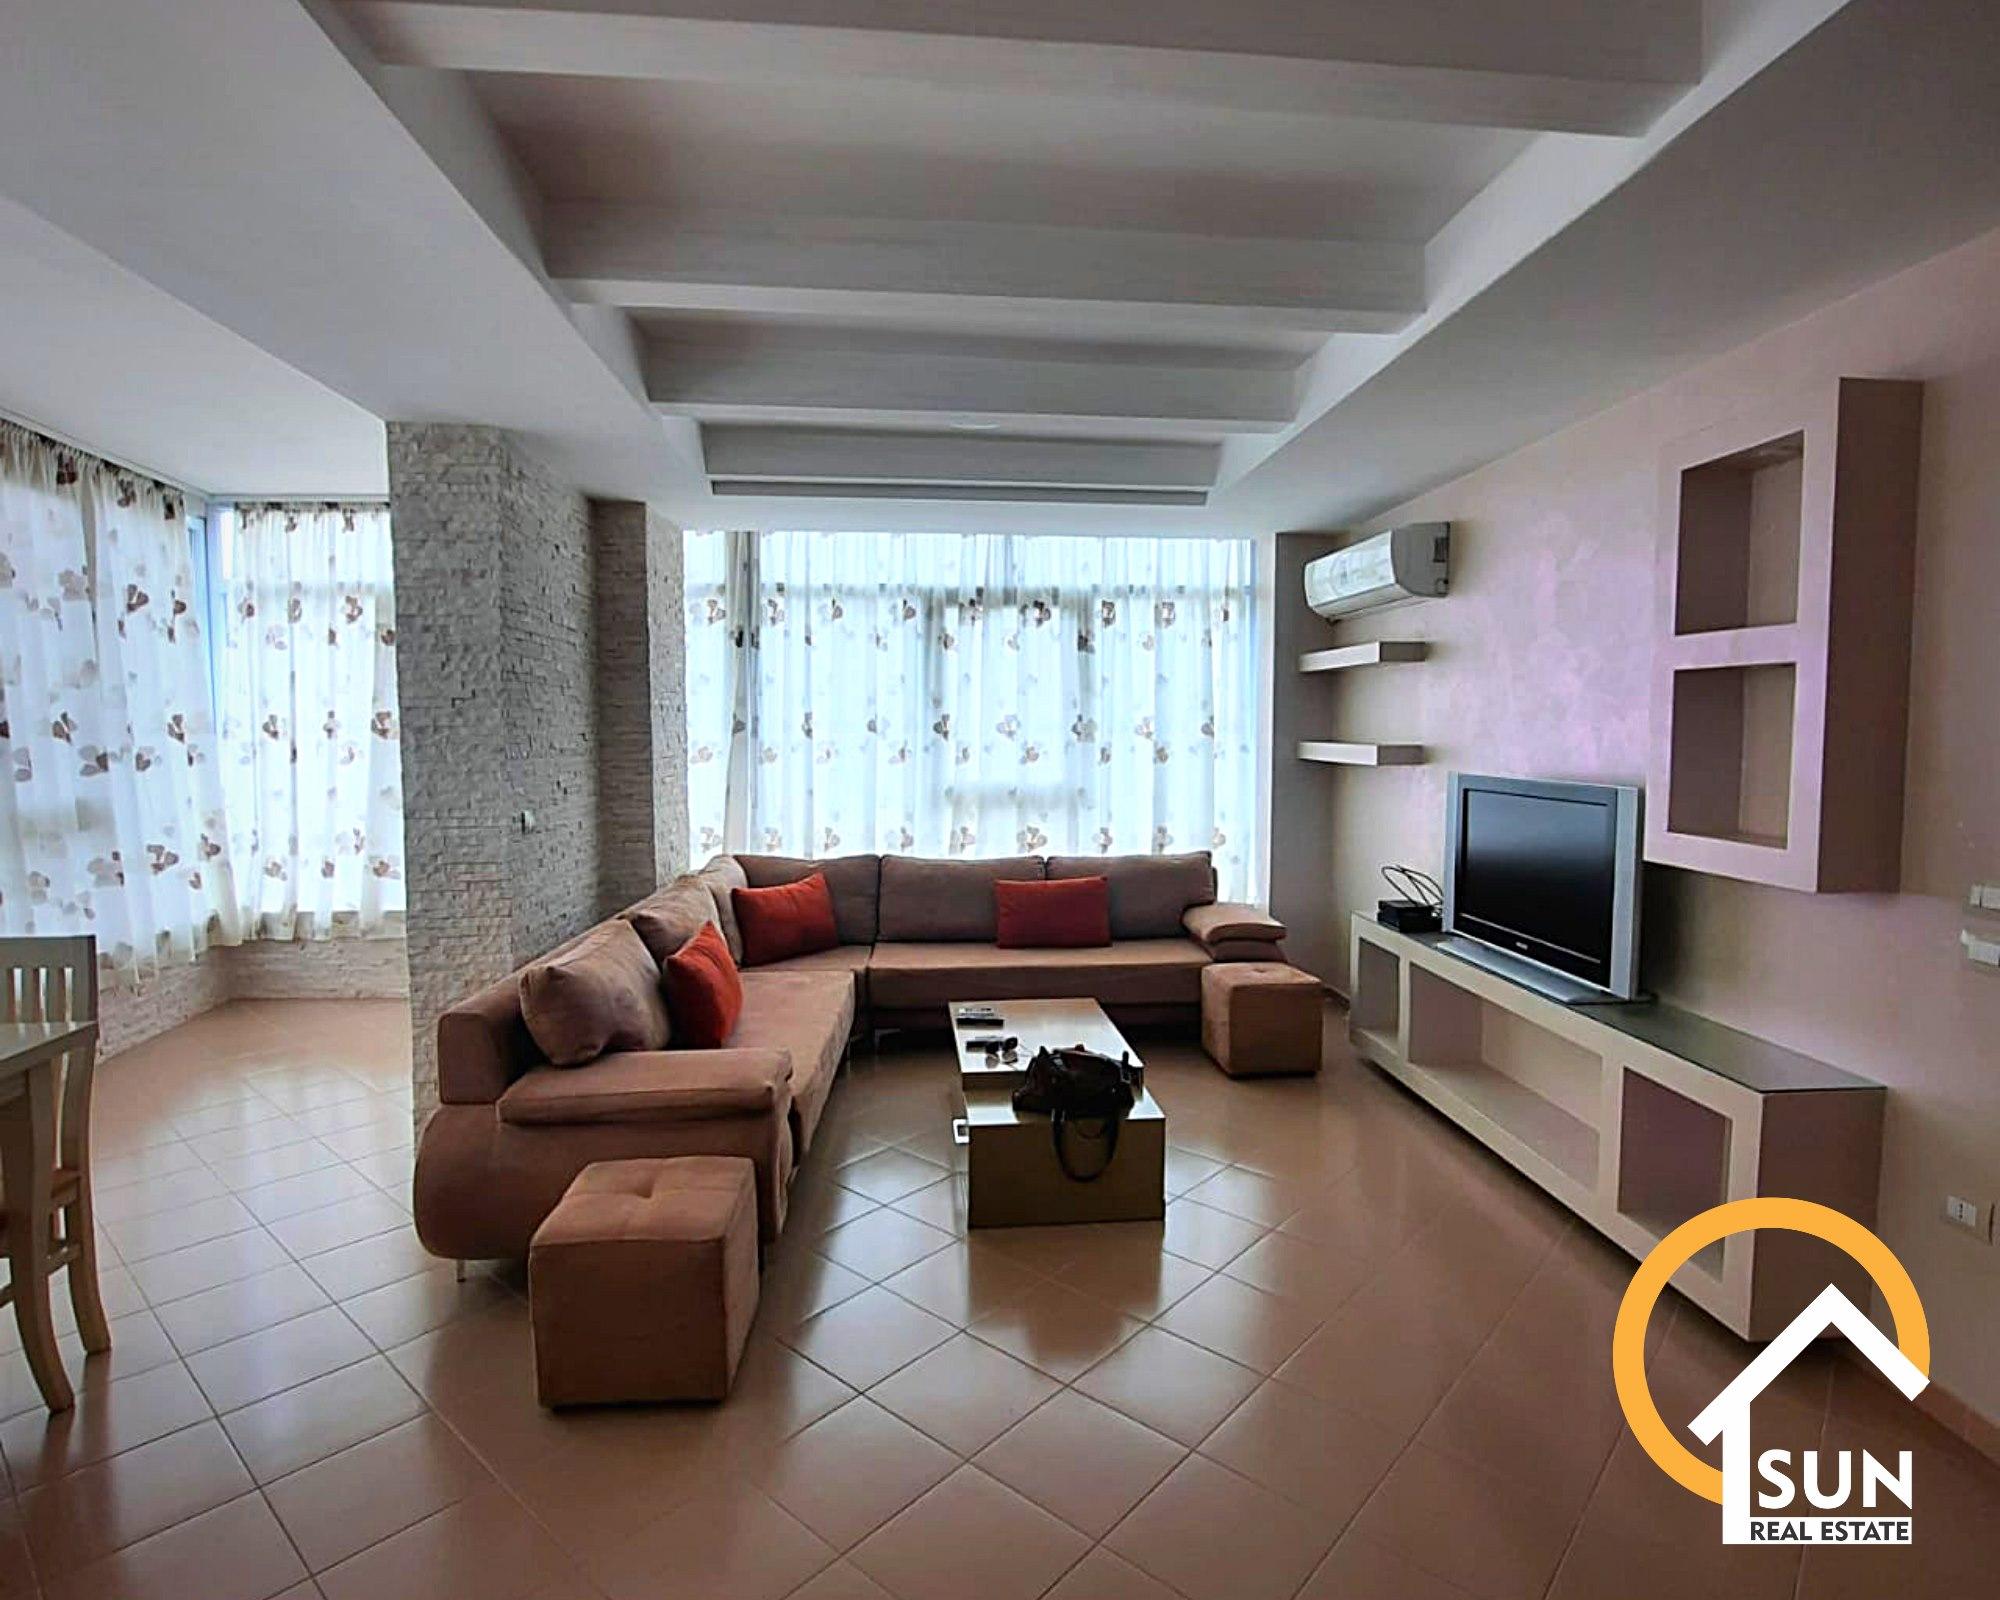 Apartament 2+1 me qira n Shkoder